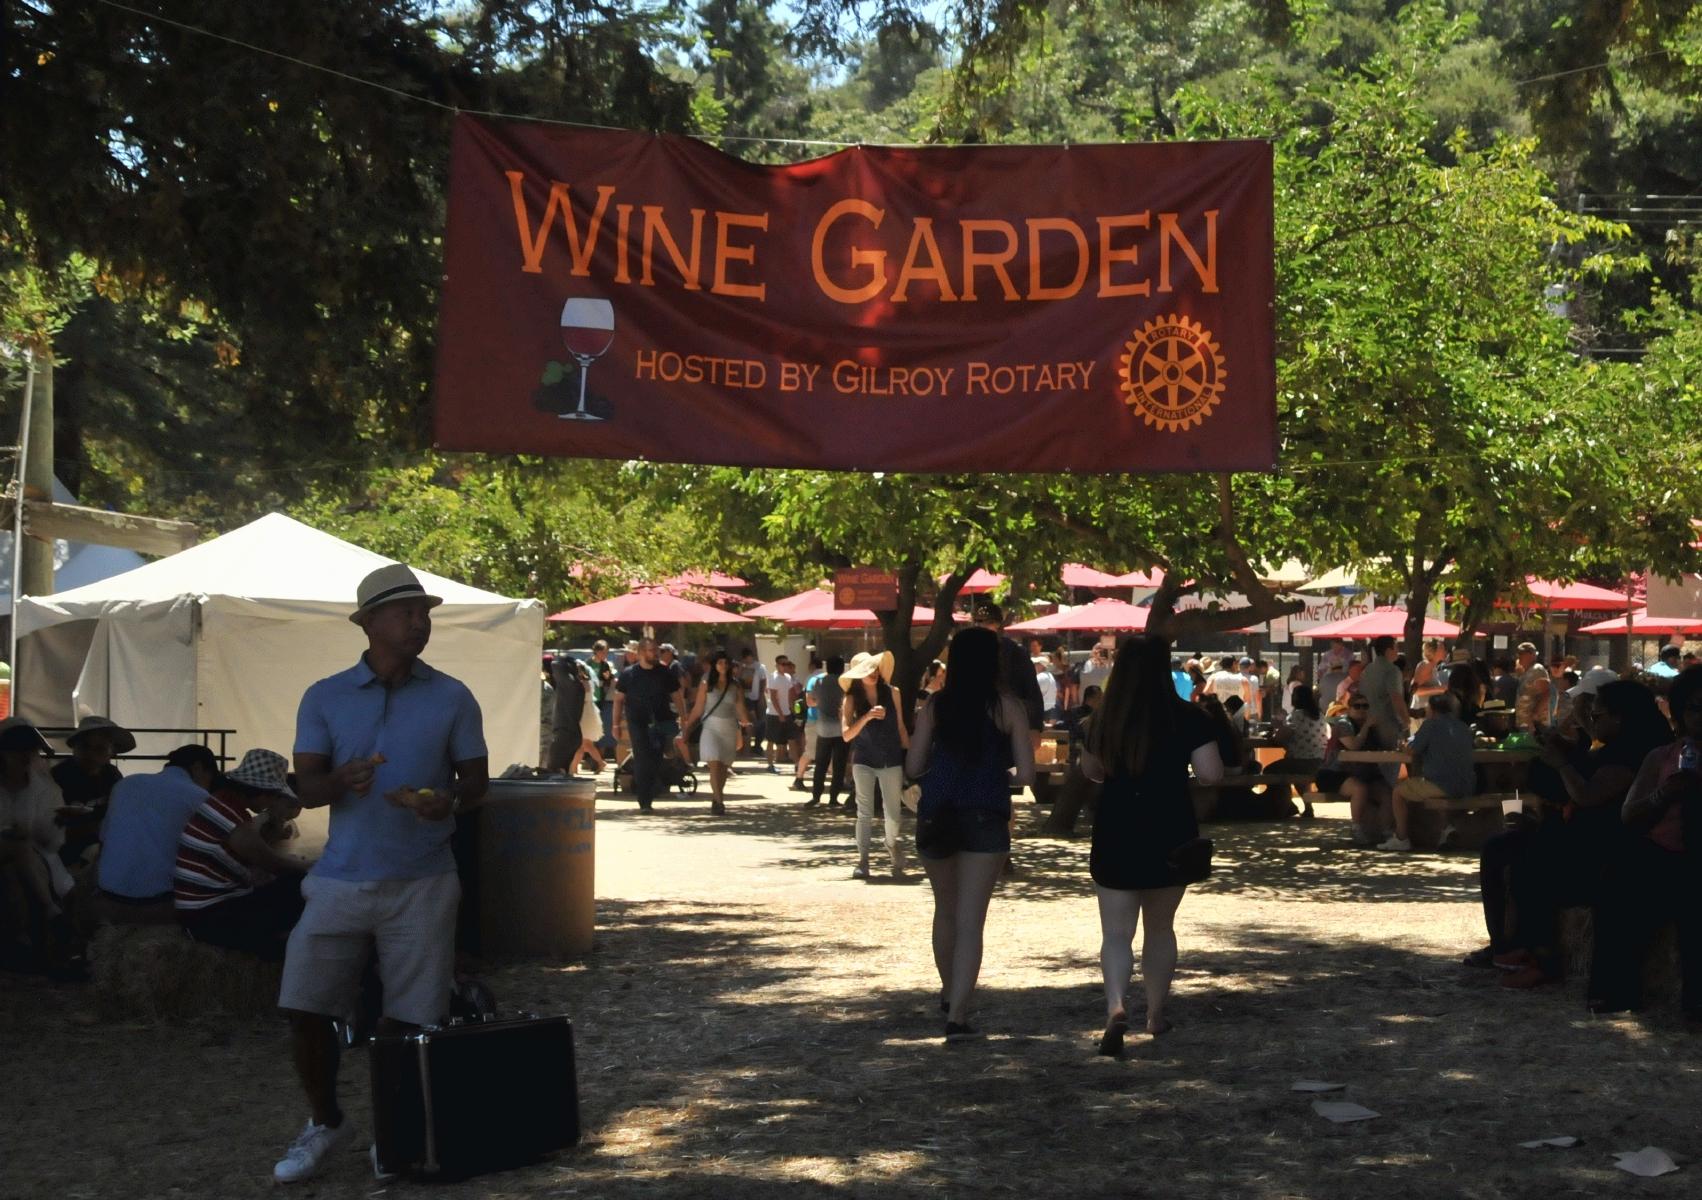 Christmas Hill Park California.Bcx News Wine Garden In The 2017 Gilroy Garlic Festival At